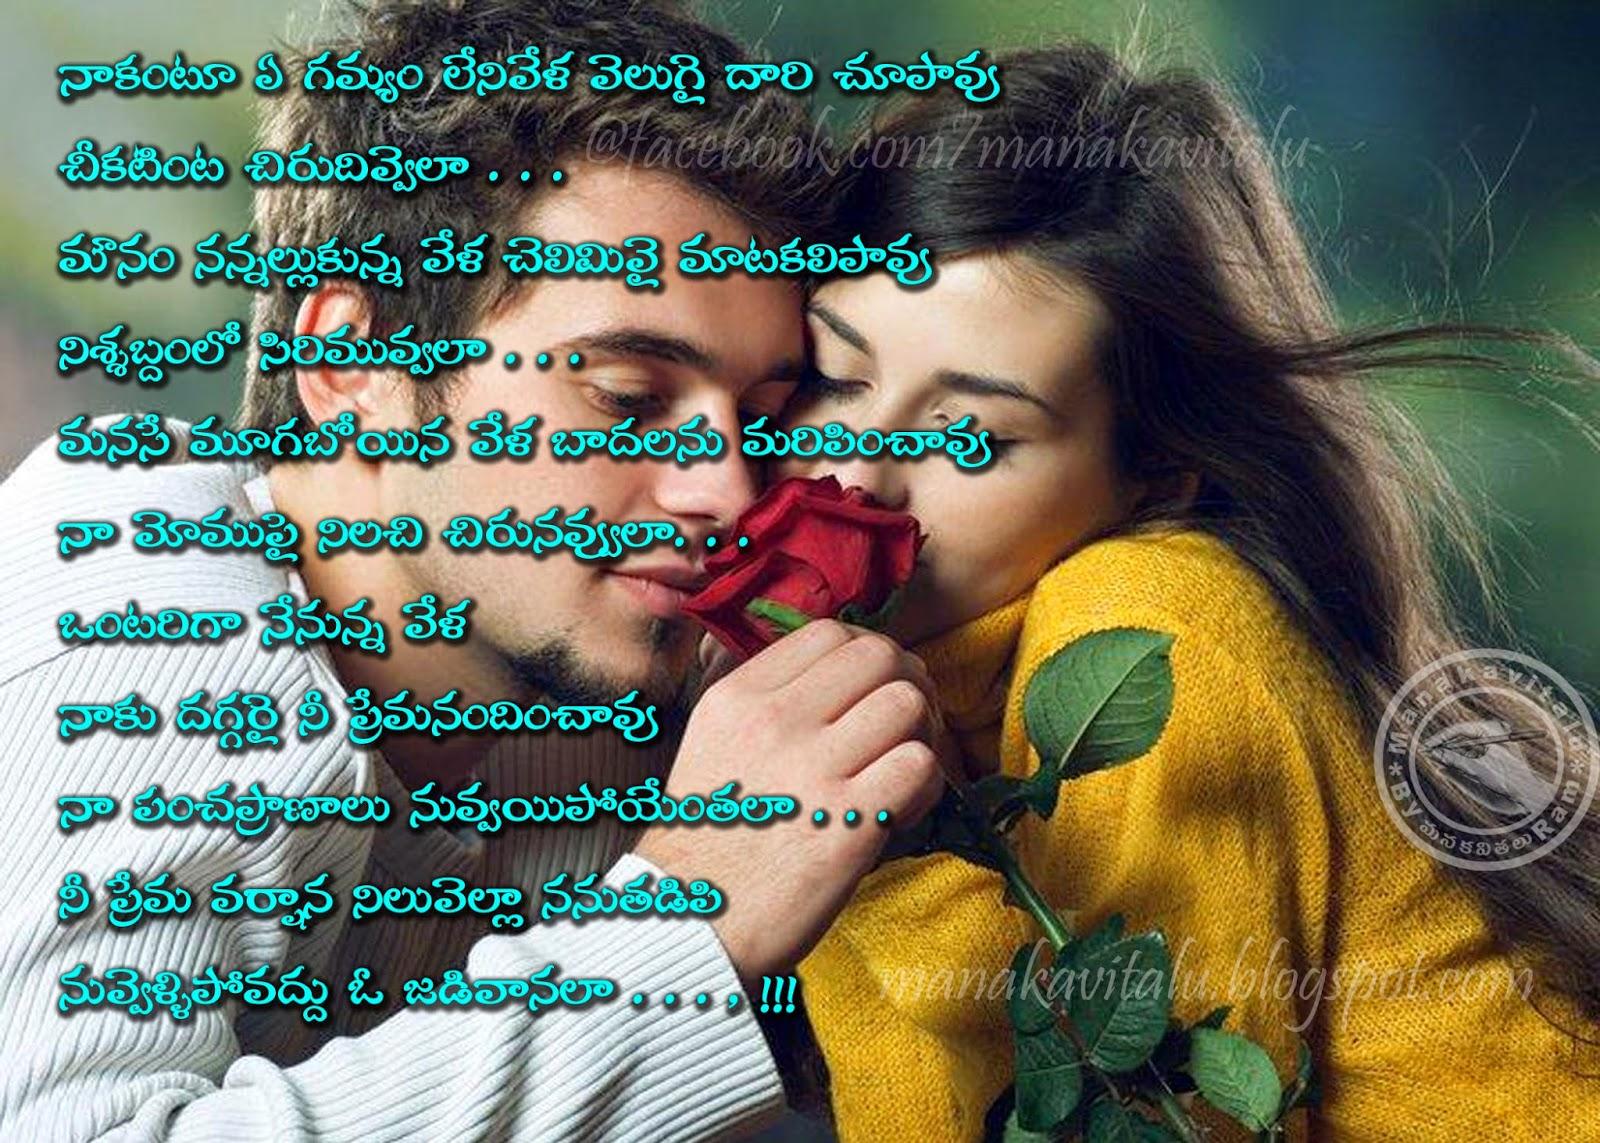 nice Telugu love kavitha images